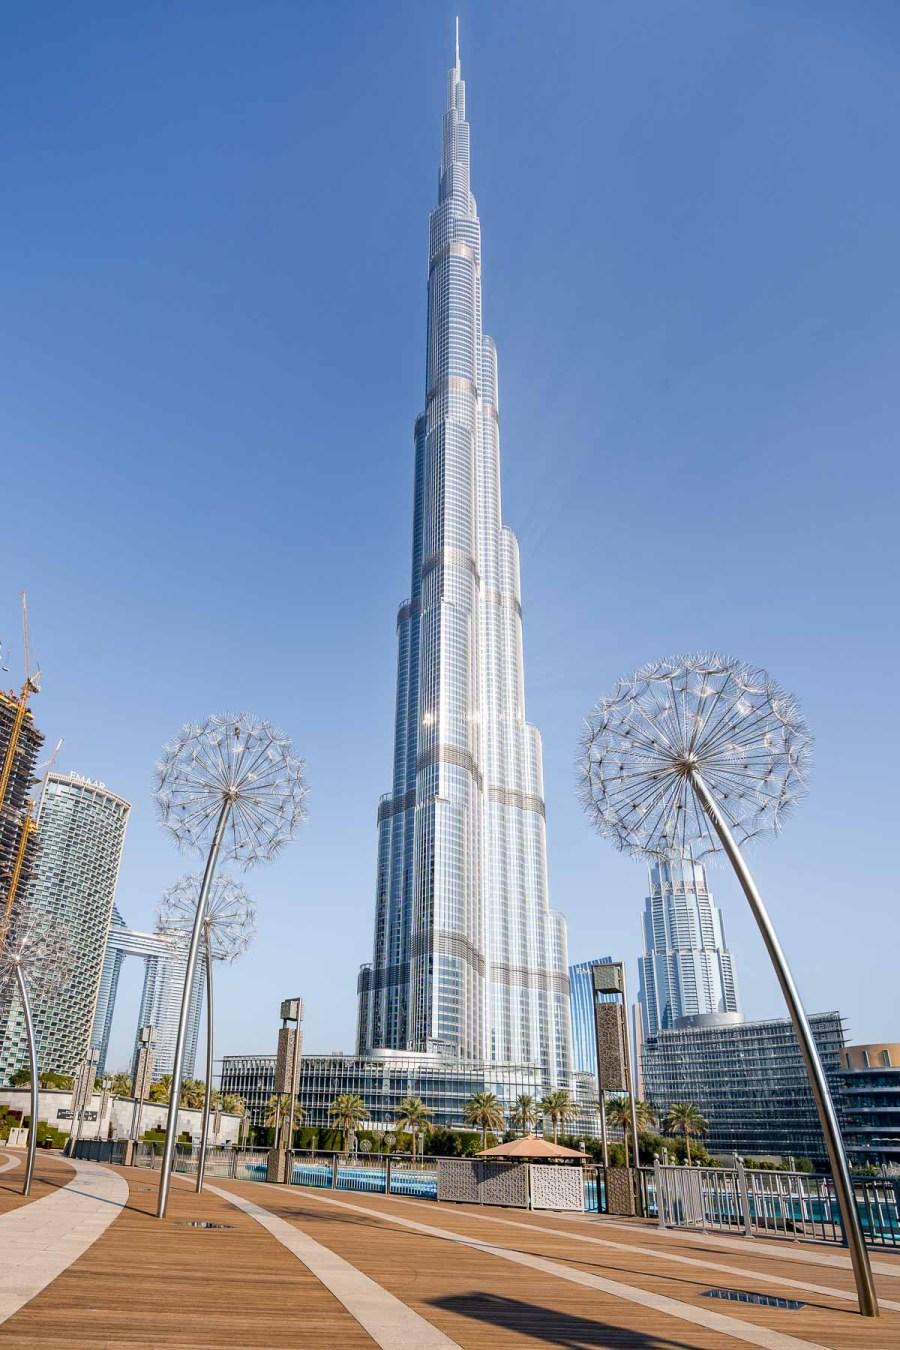 View of the Burj Khalifa from Burj Park by Emaar in Dubai